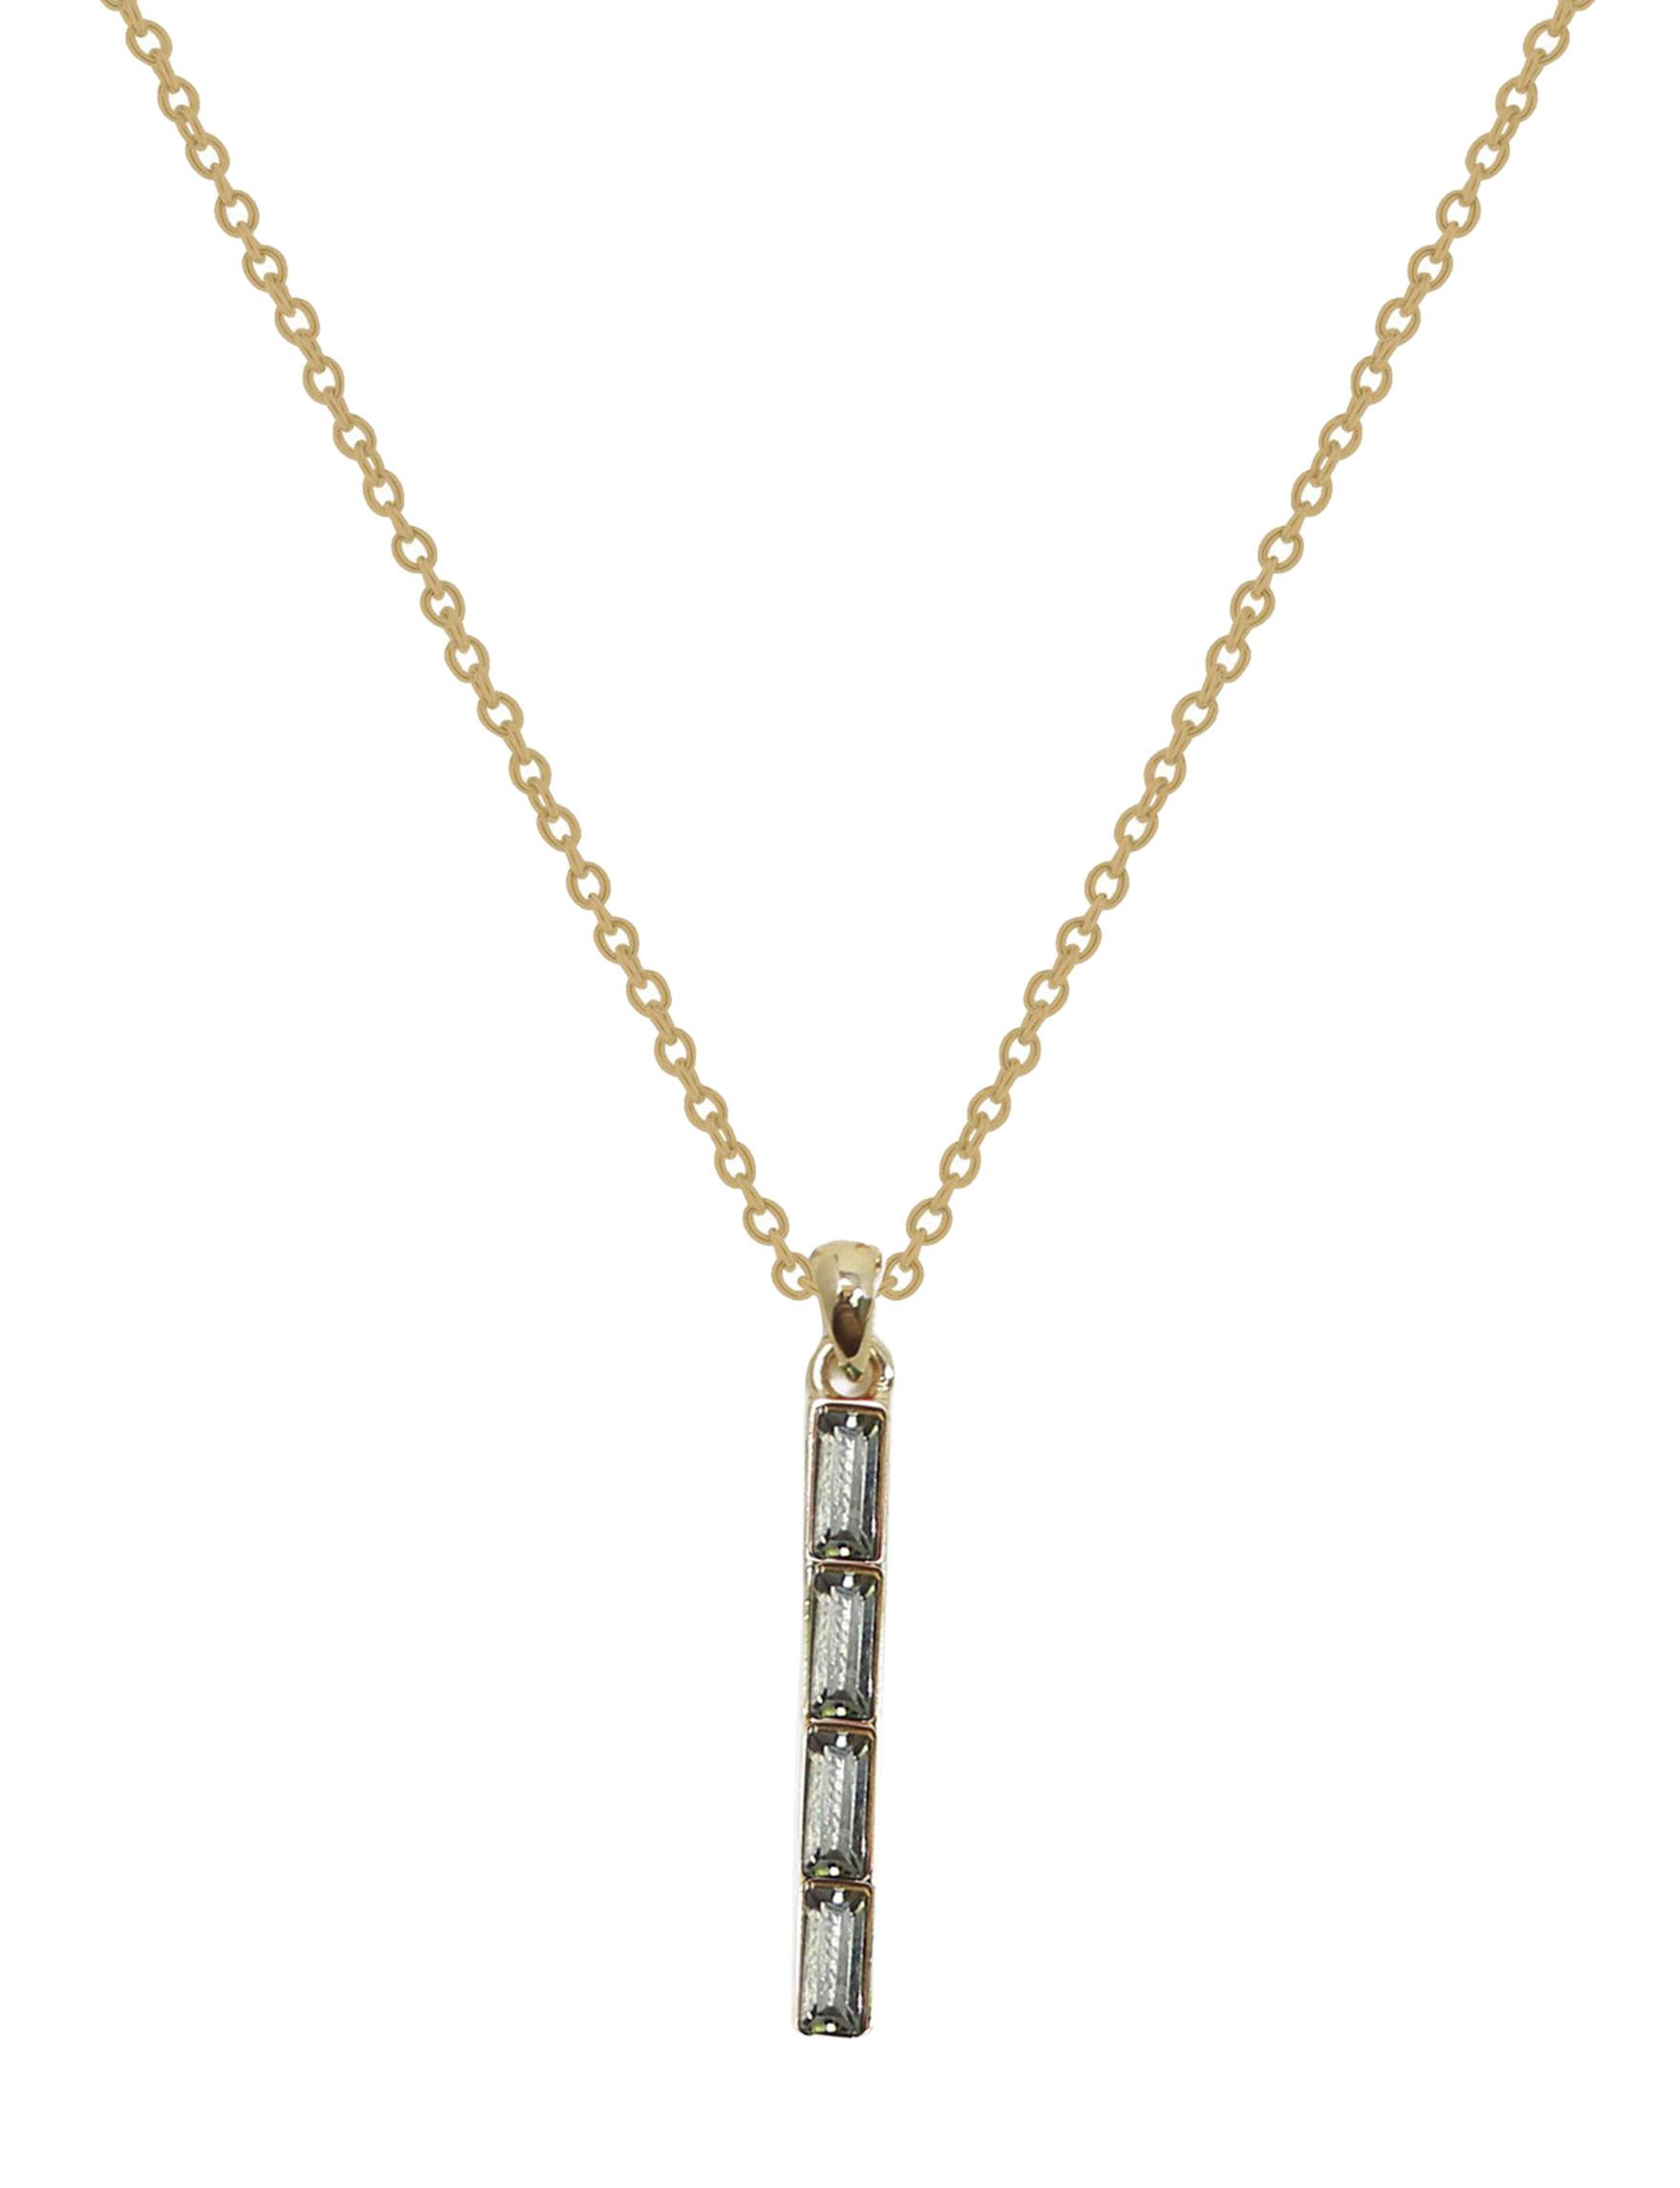 L & J Clear Necklaces & Pendants Fine Jewelry